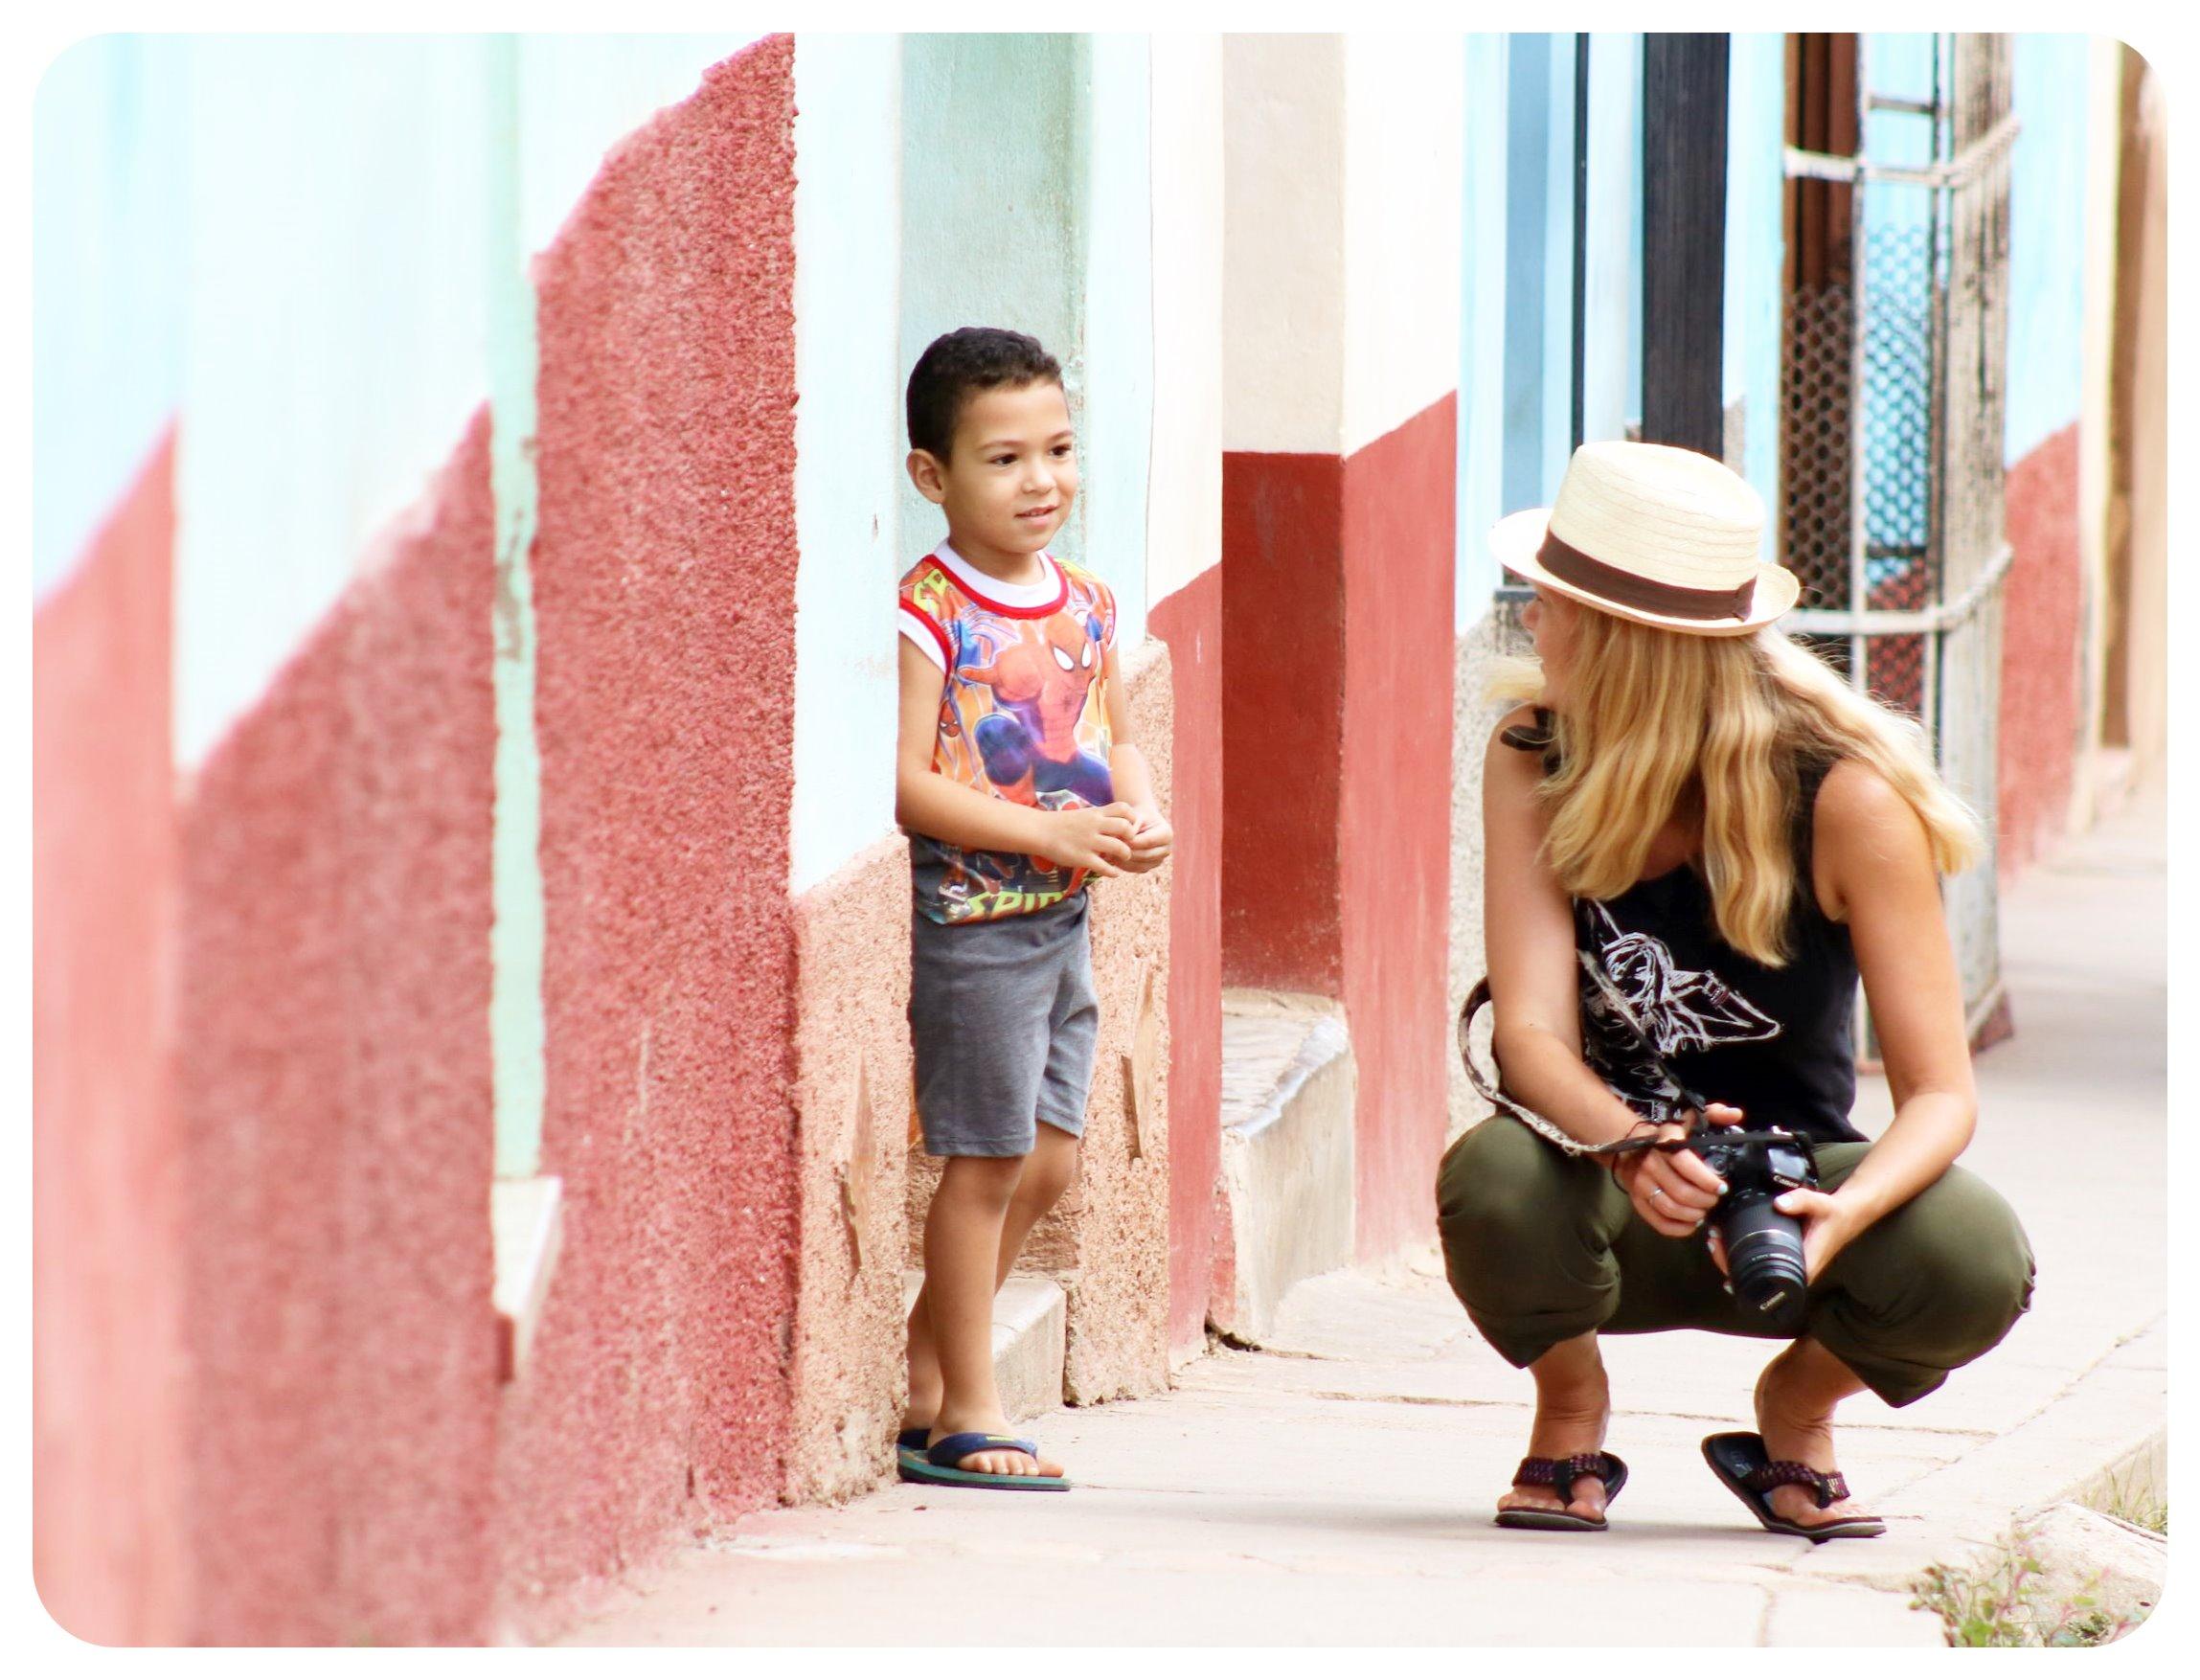 dani and kid in trinidad cuba